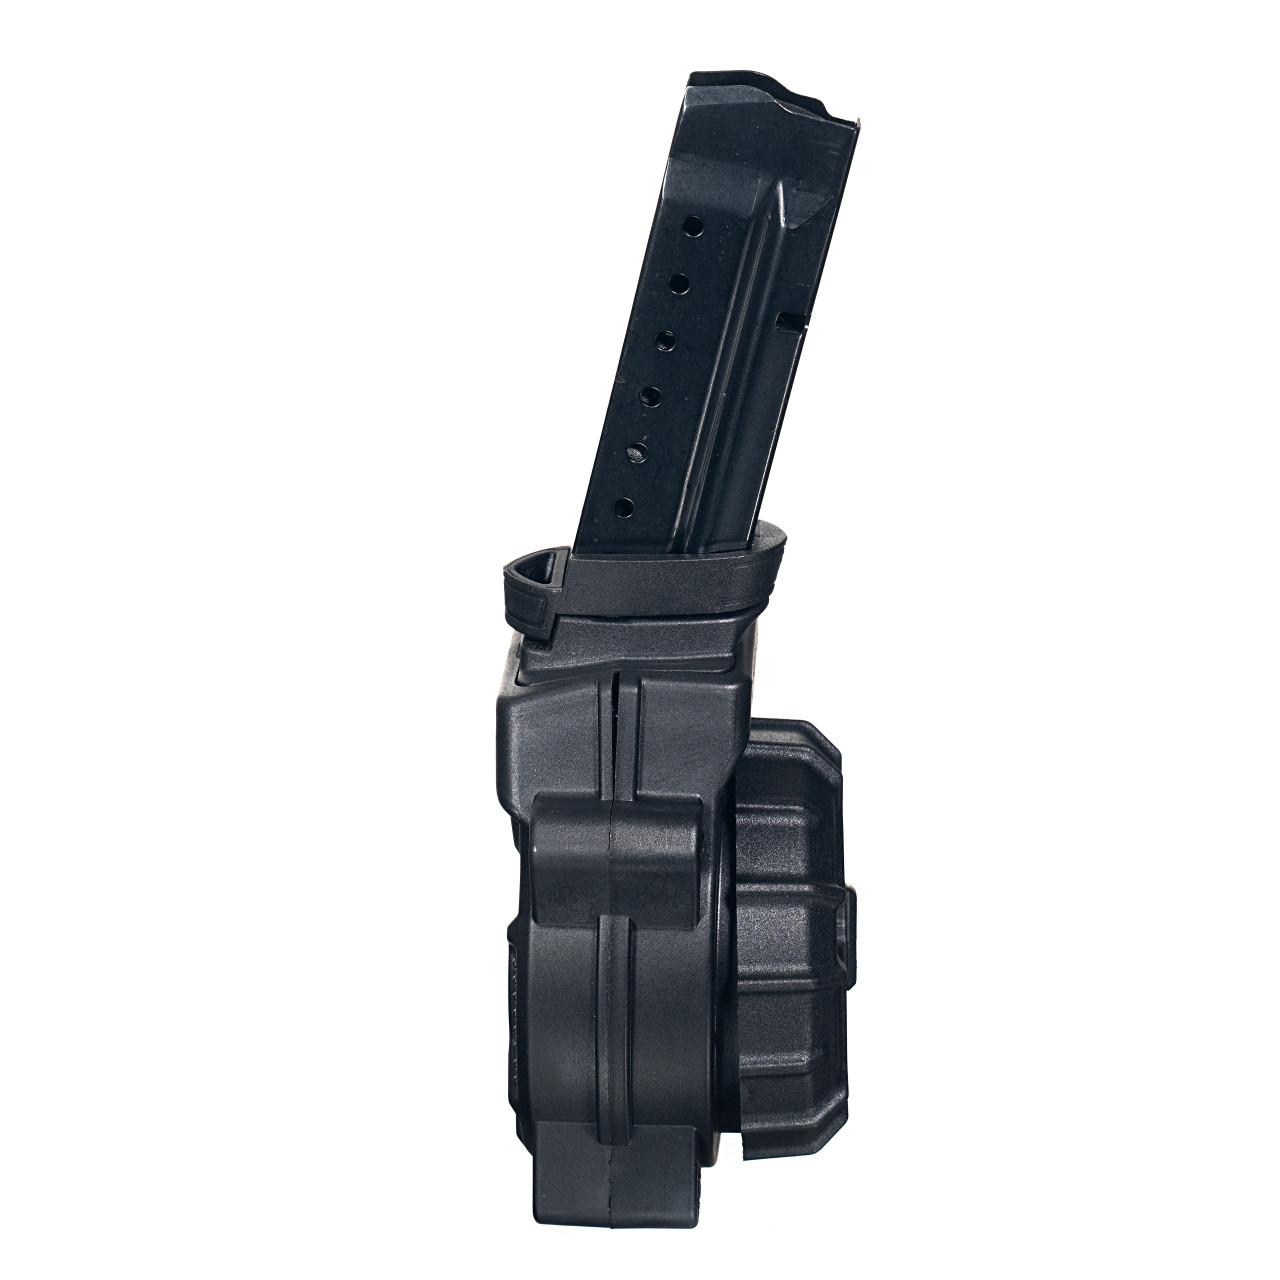 Fits the Glock® Model 17 & 19 9mm (30) Rd - Black Polymer Drum